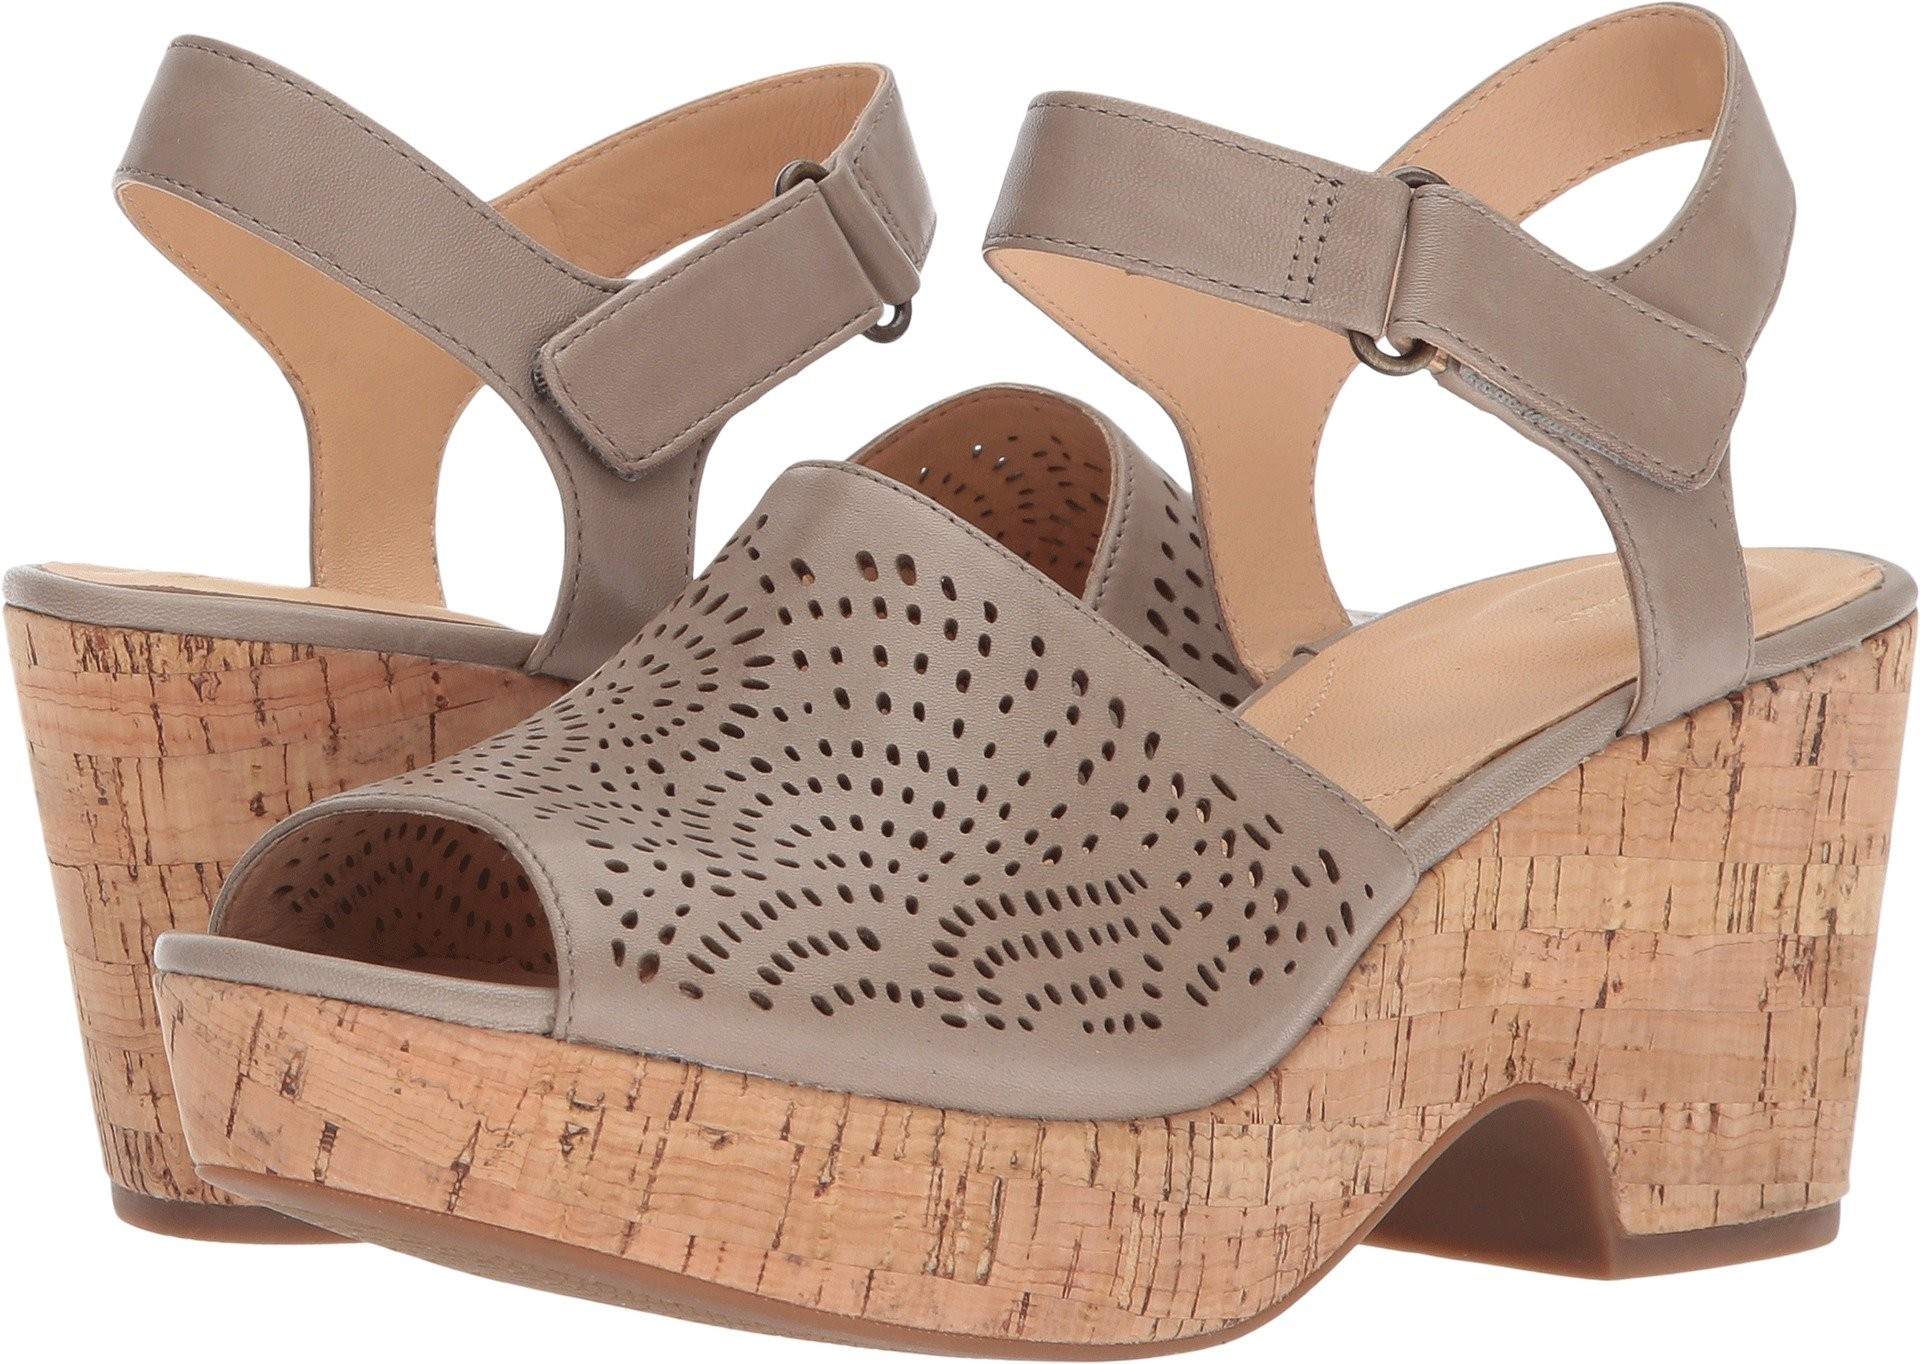 CLARKS Women's maritsa Nila Sand Leather 9.5 D US